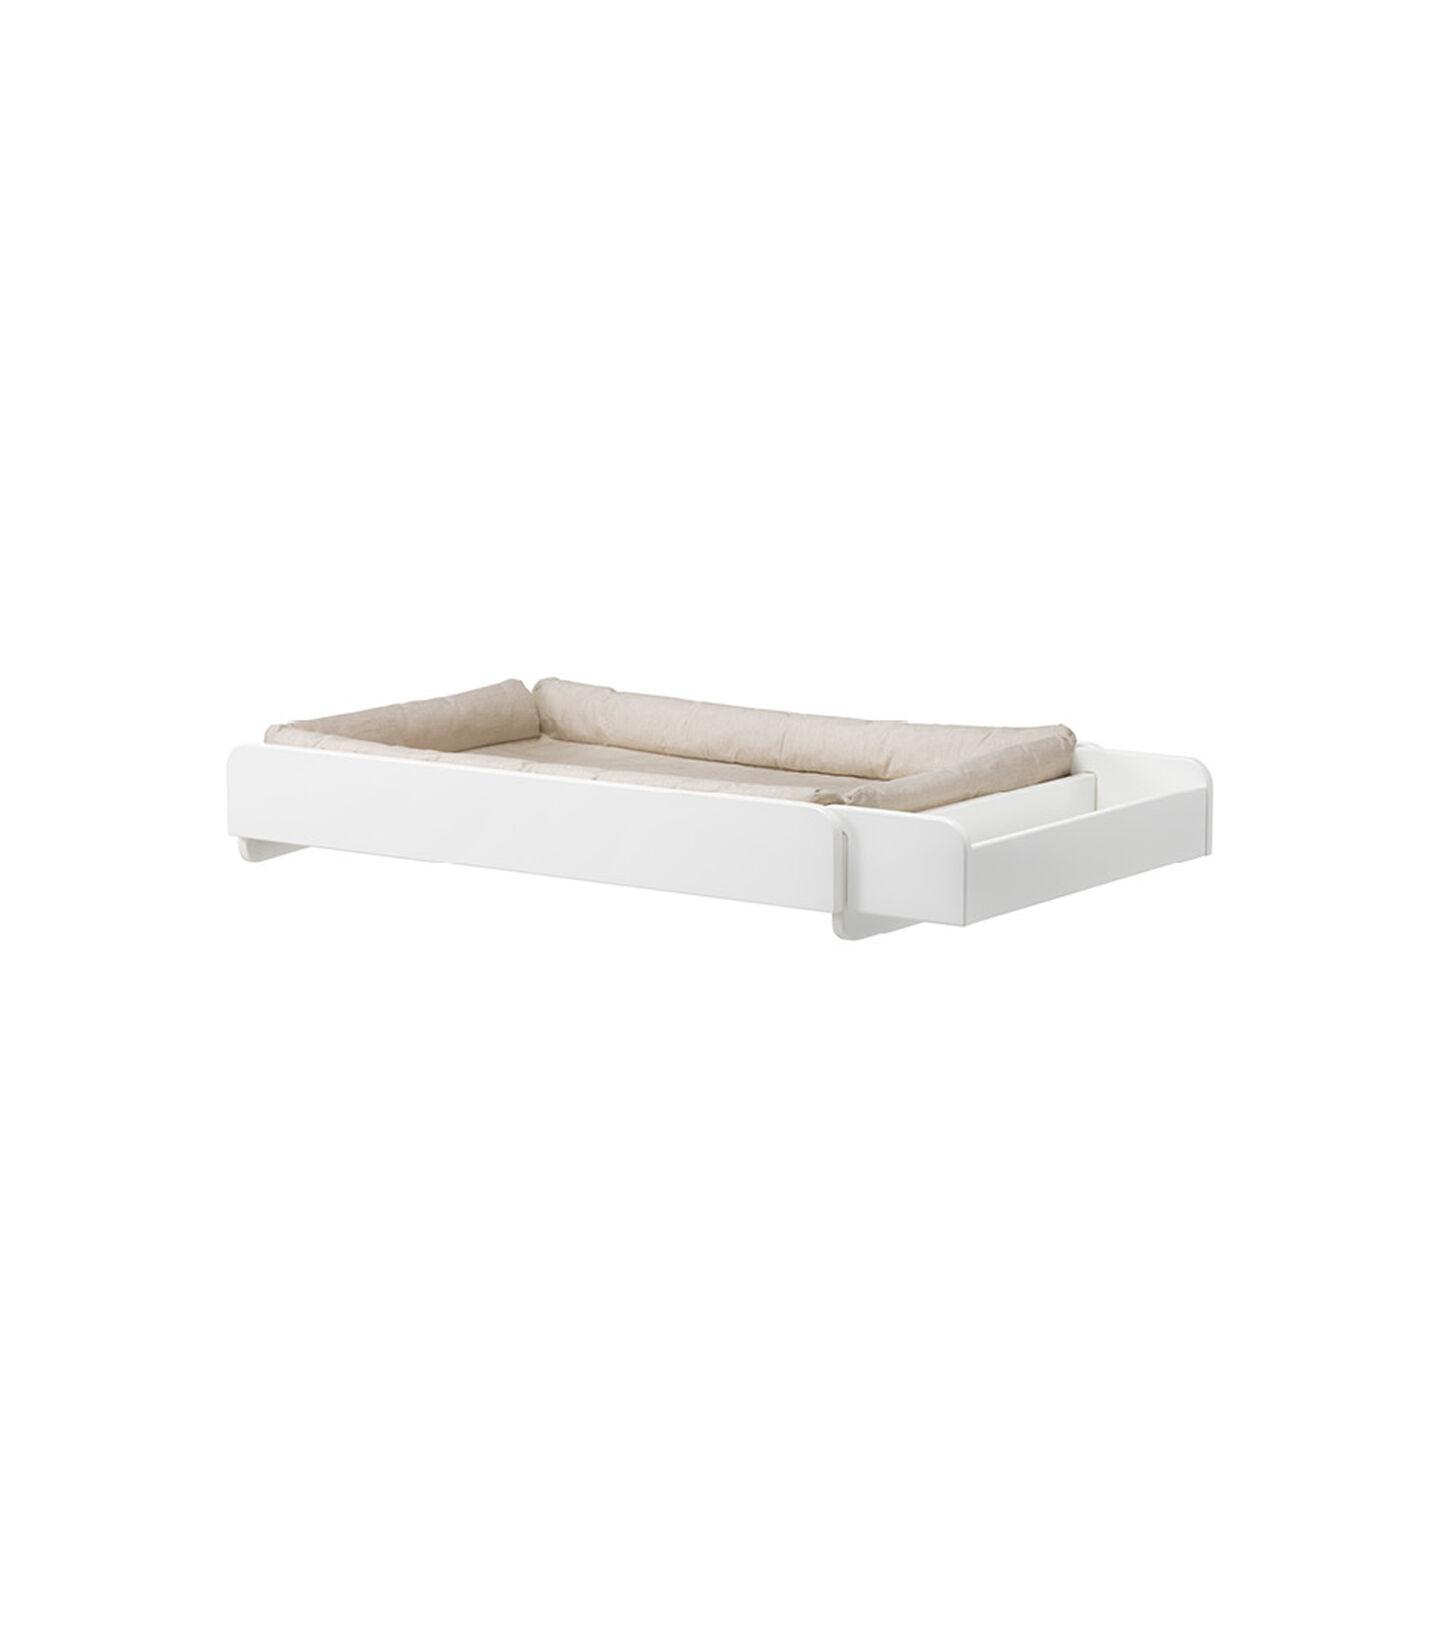 Stokke® Home™ Cambiador blanco con colchón, Blanco, mainview view 1